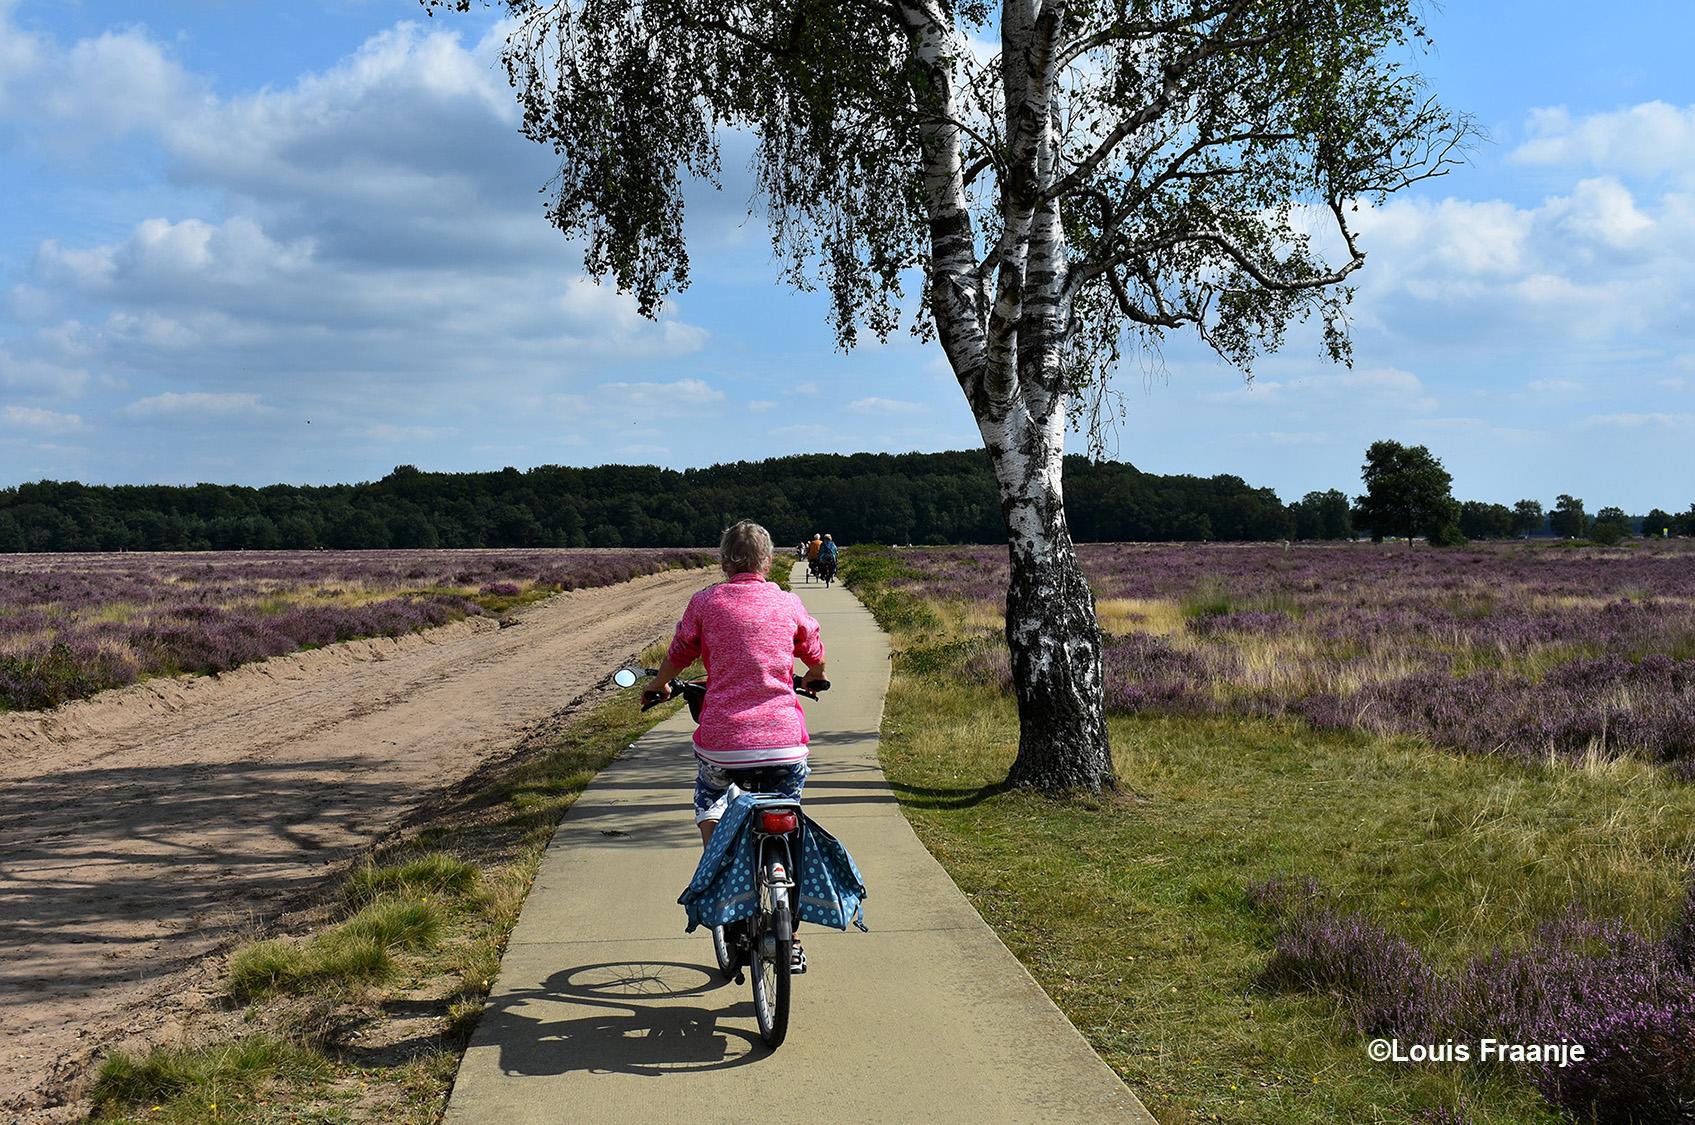 En dan zo'n prachtige eenzame berk langs het fietspad - Foto: ©Louis Fraanje